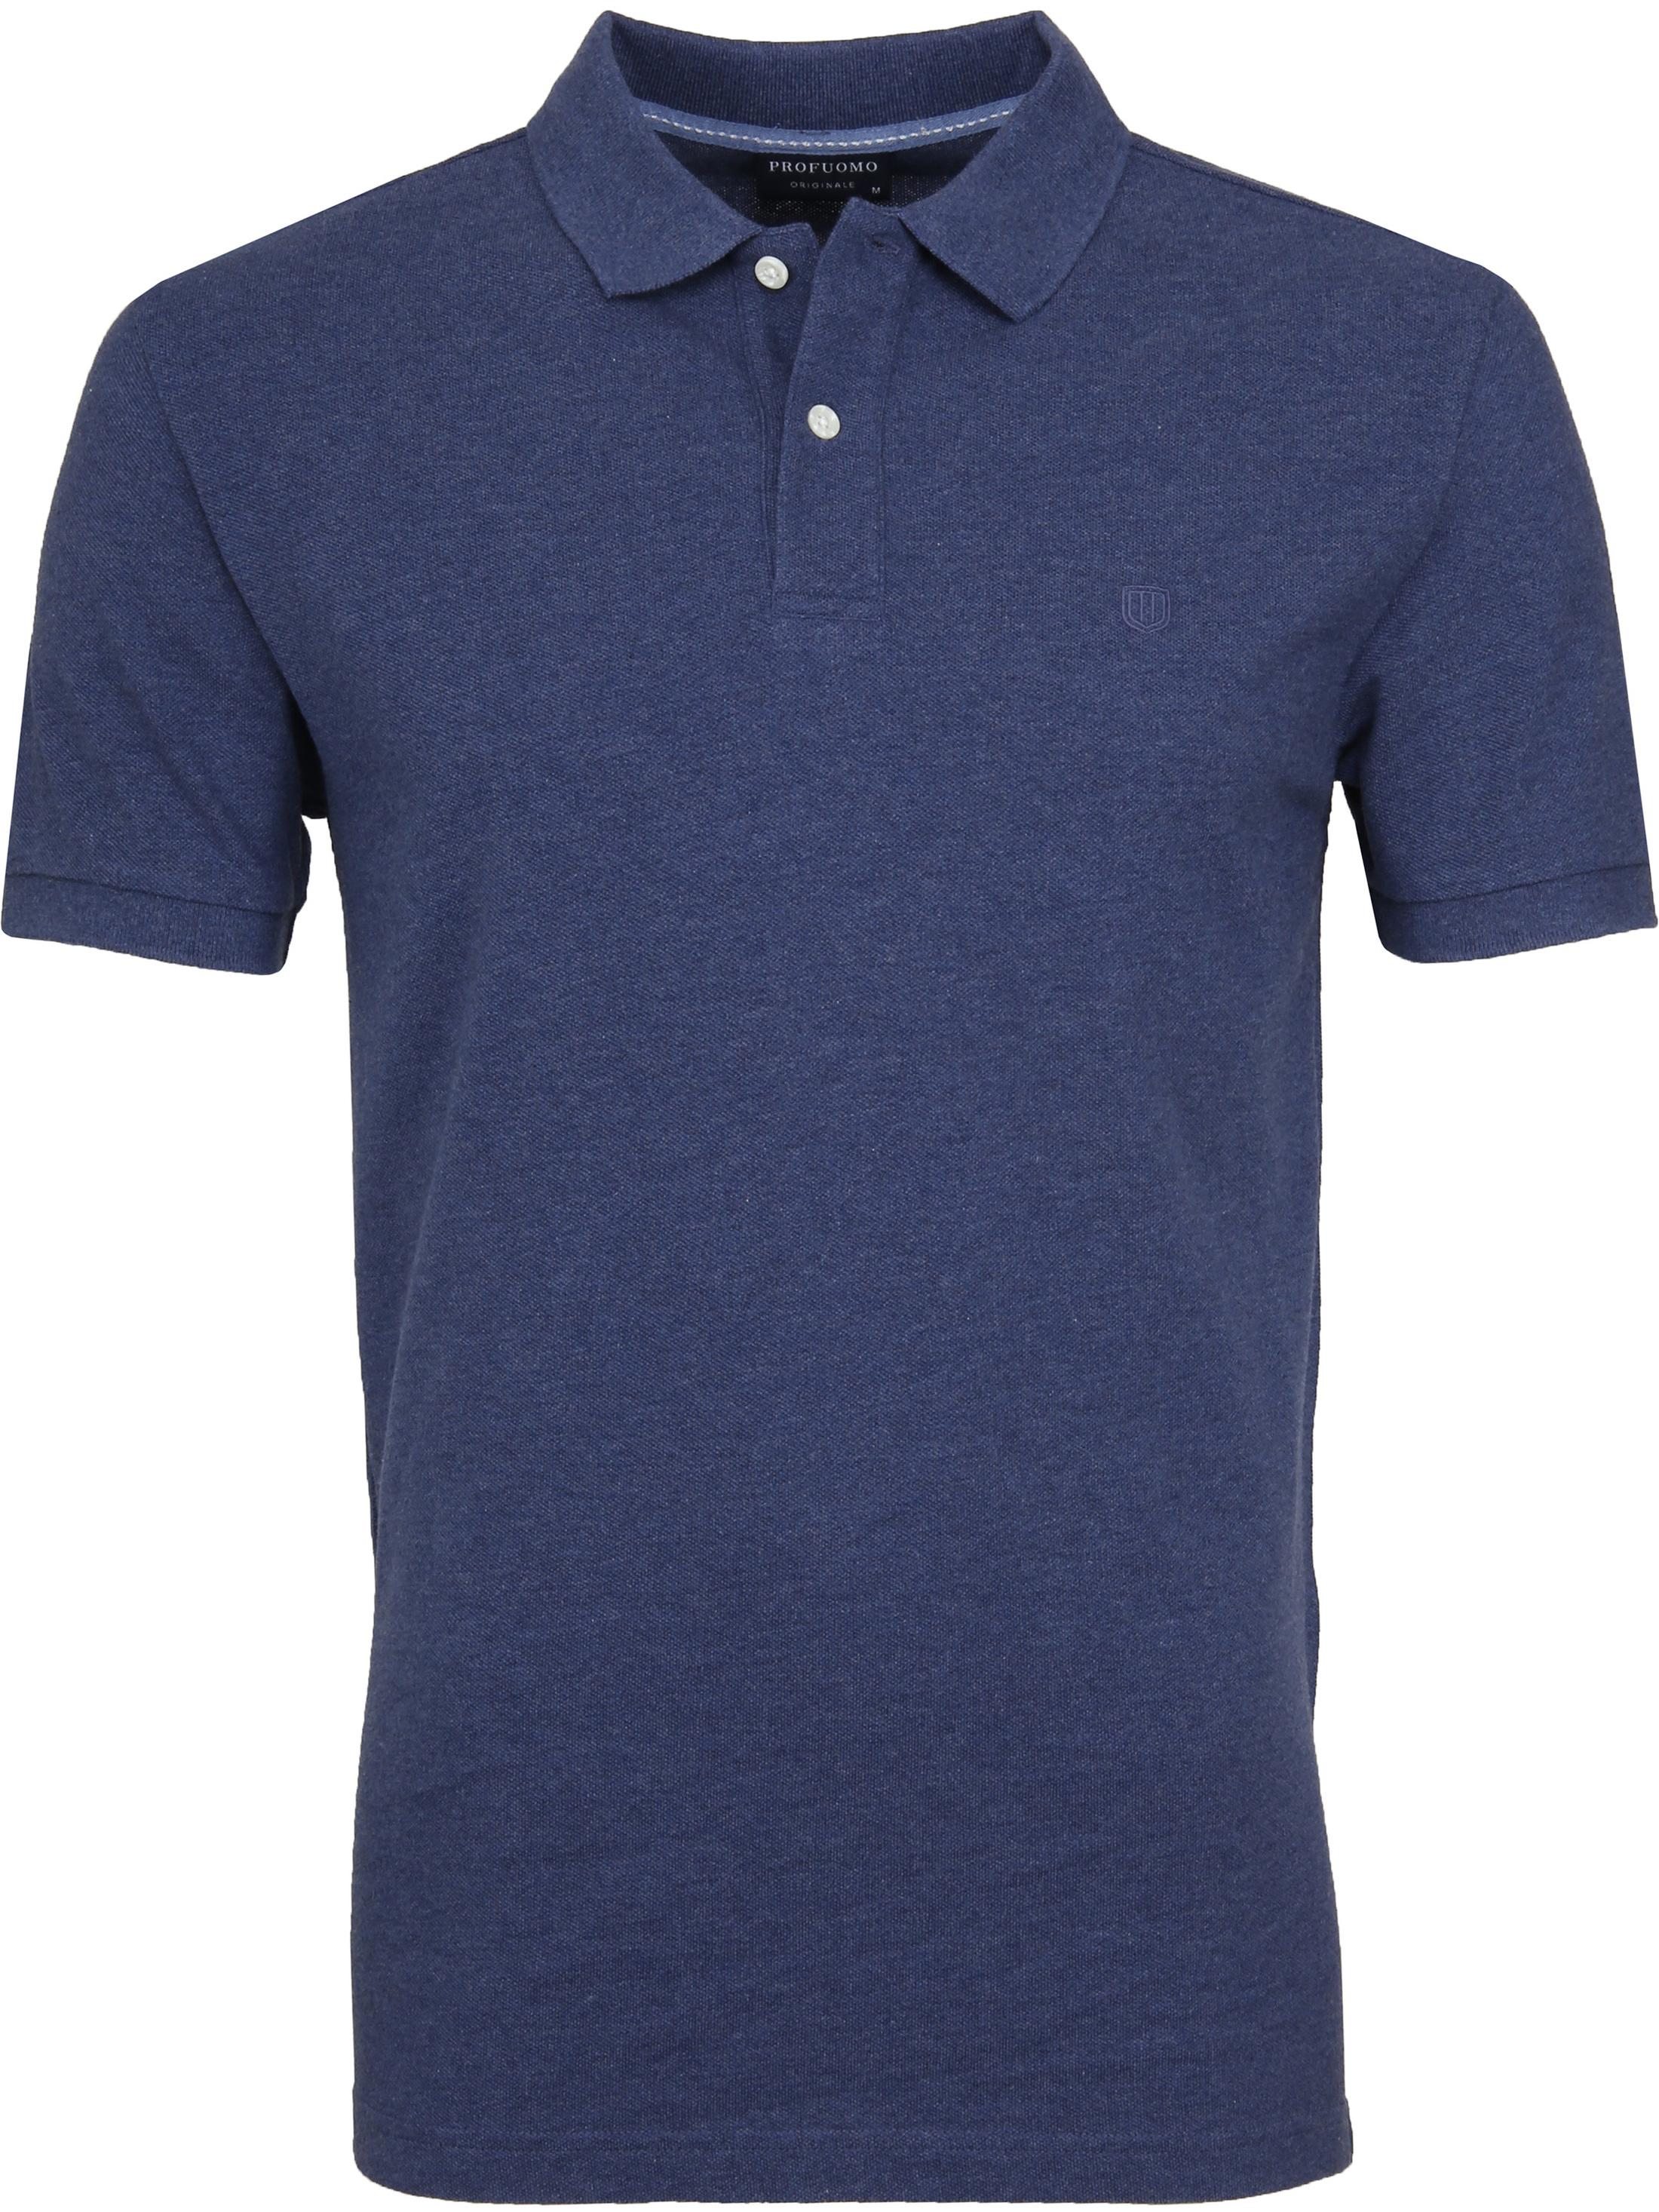 Profuomo Short Sleeve Poloshirt Indigo foto 0